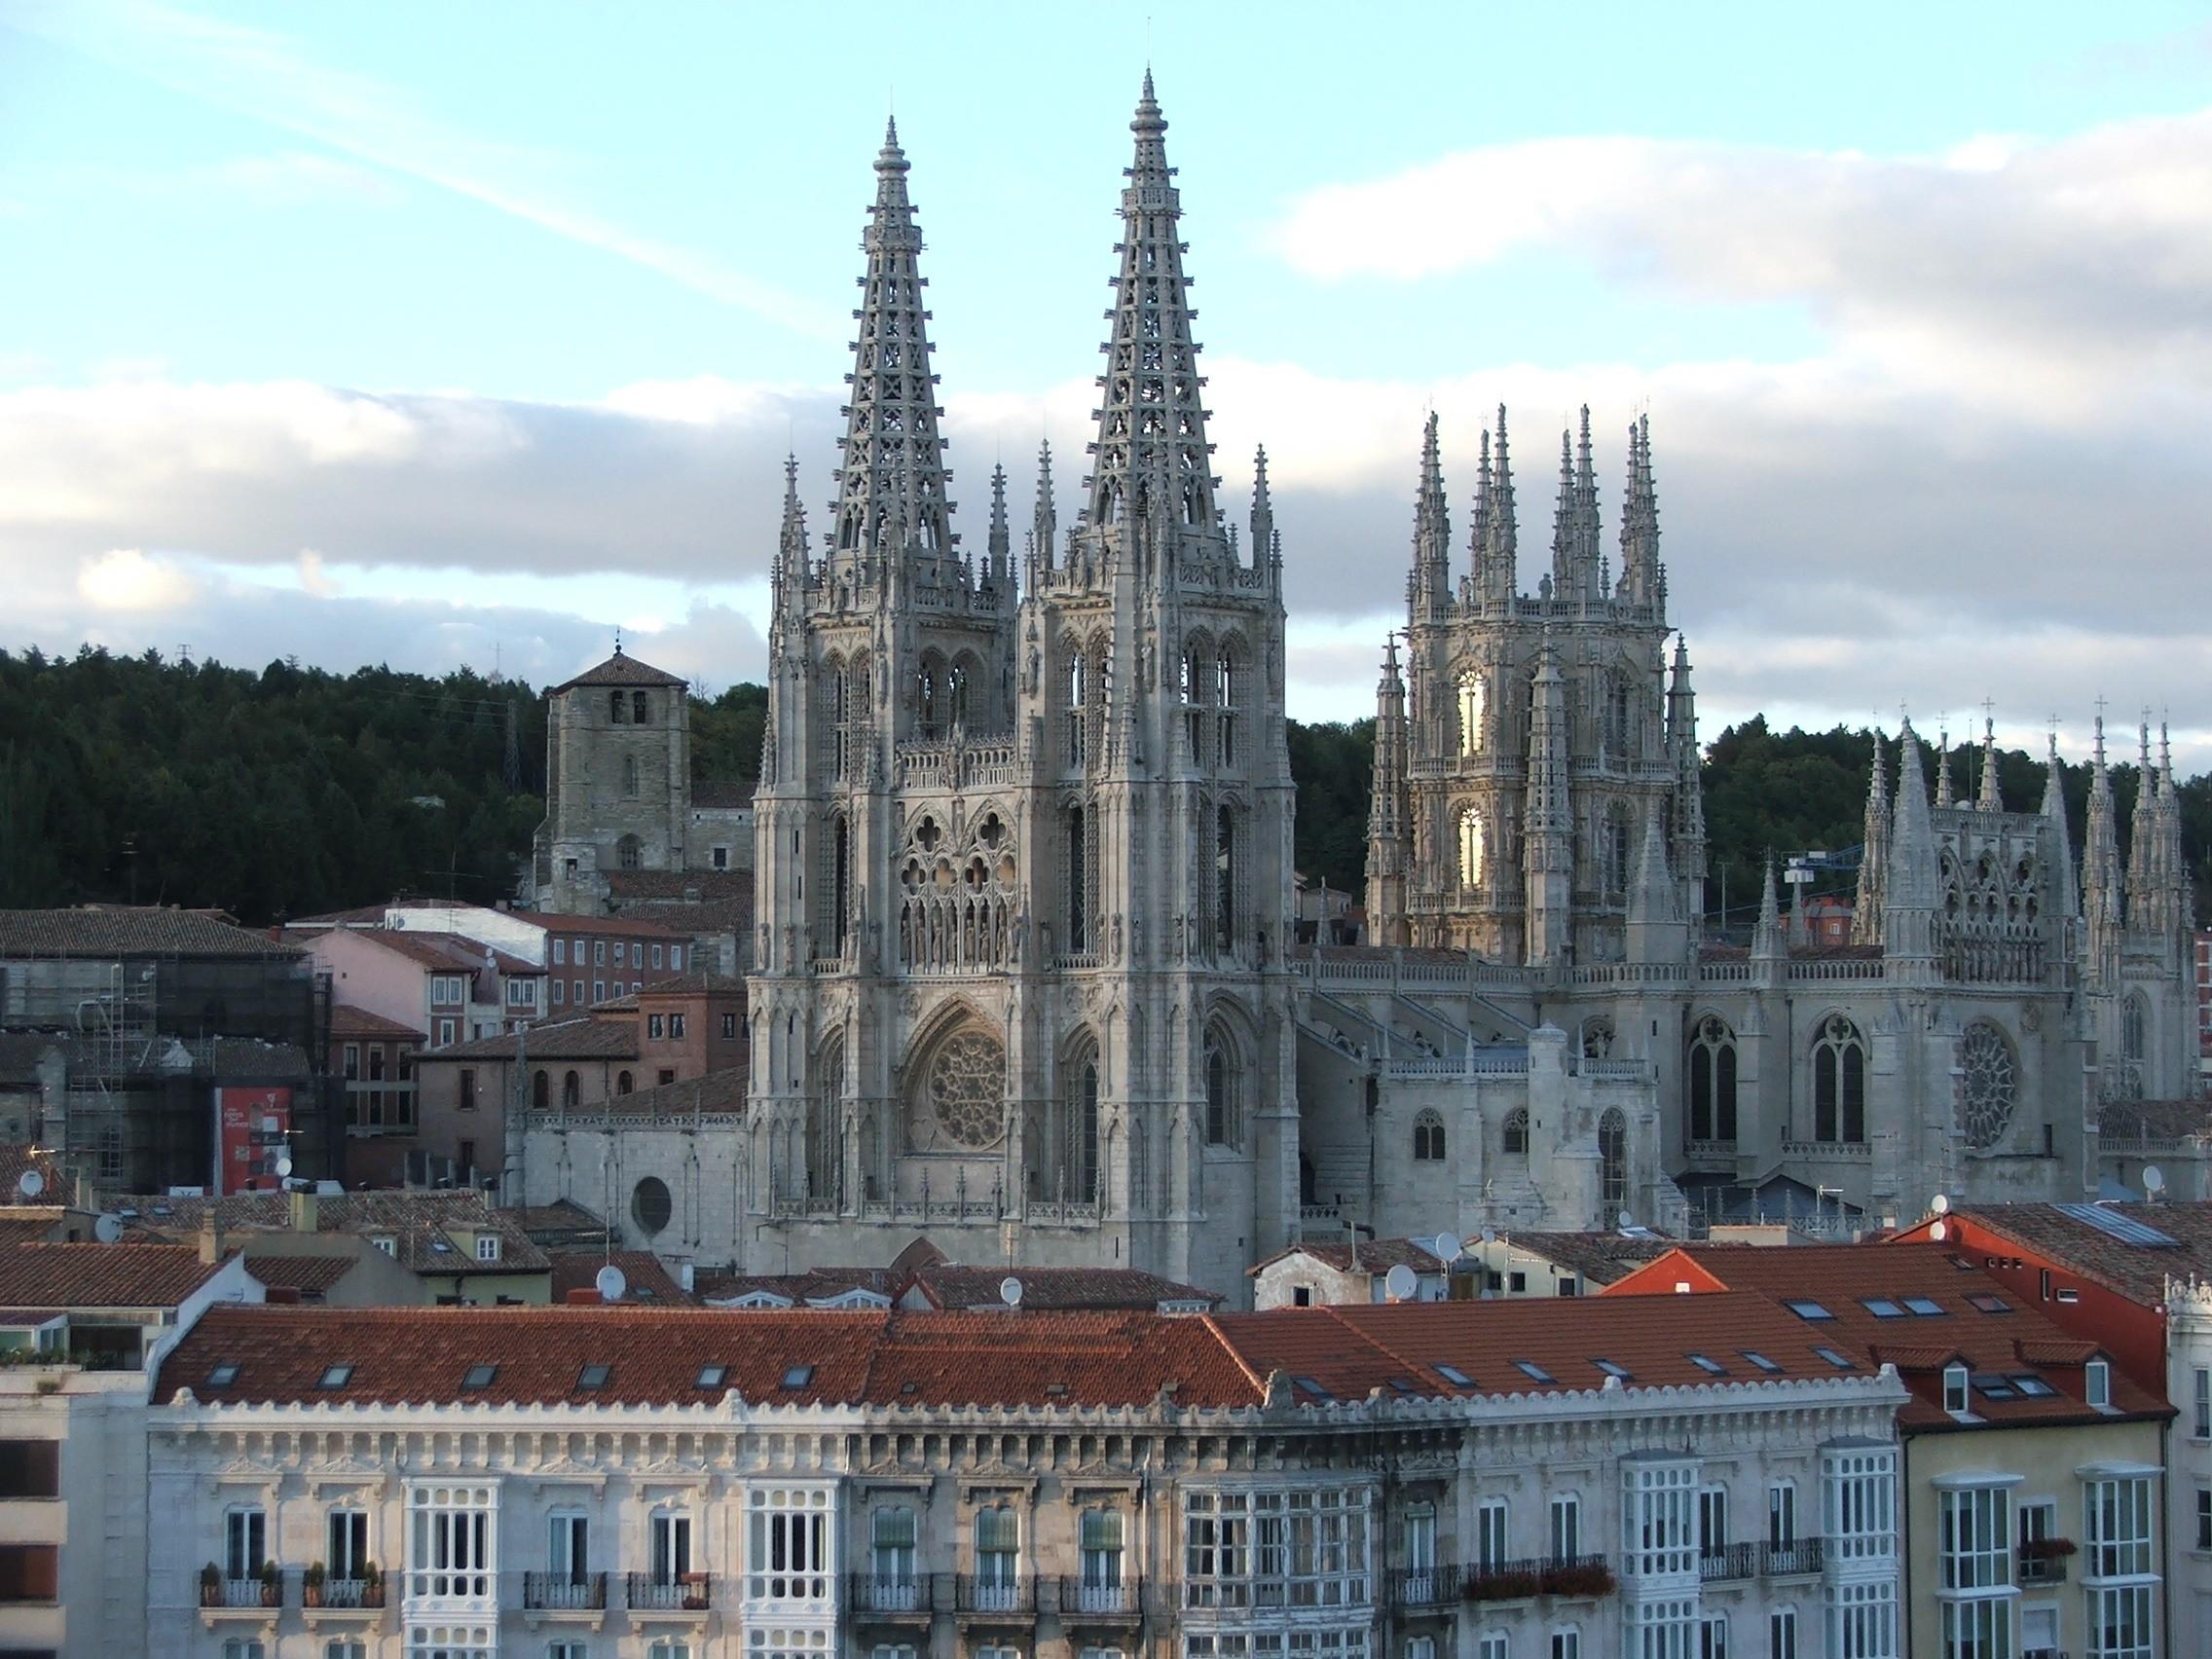 https://i1.wp.com/upload.wikimedia.org/wikipedia/commons/1/19/Catedral_de_Burgos_II.jpg